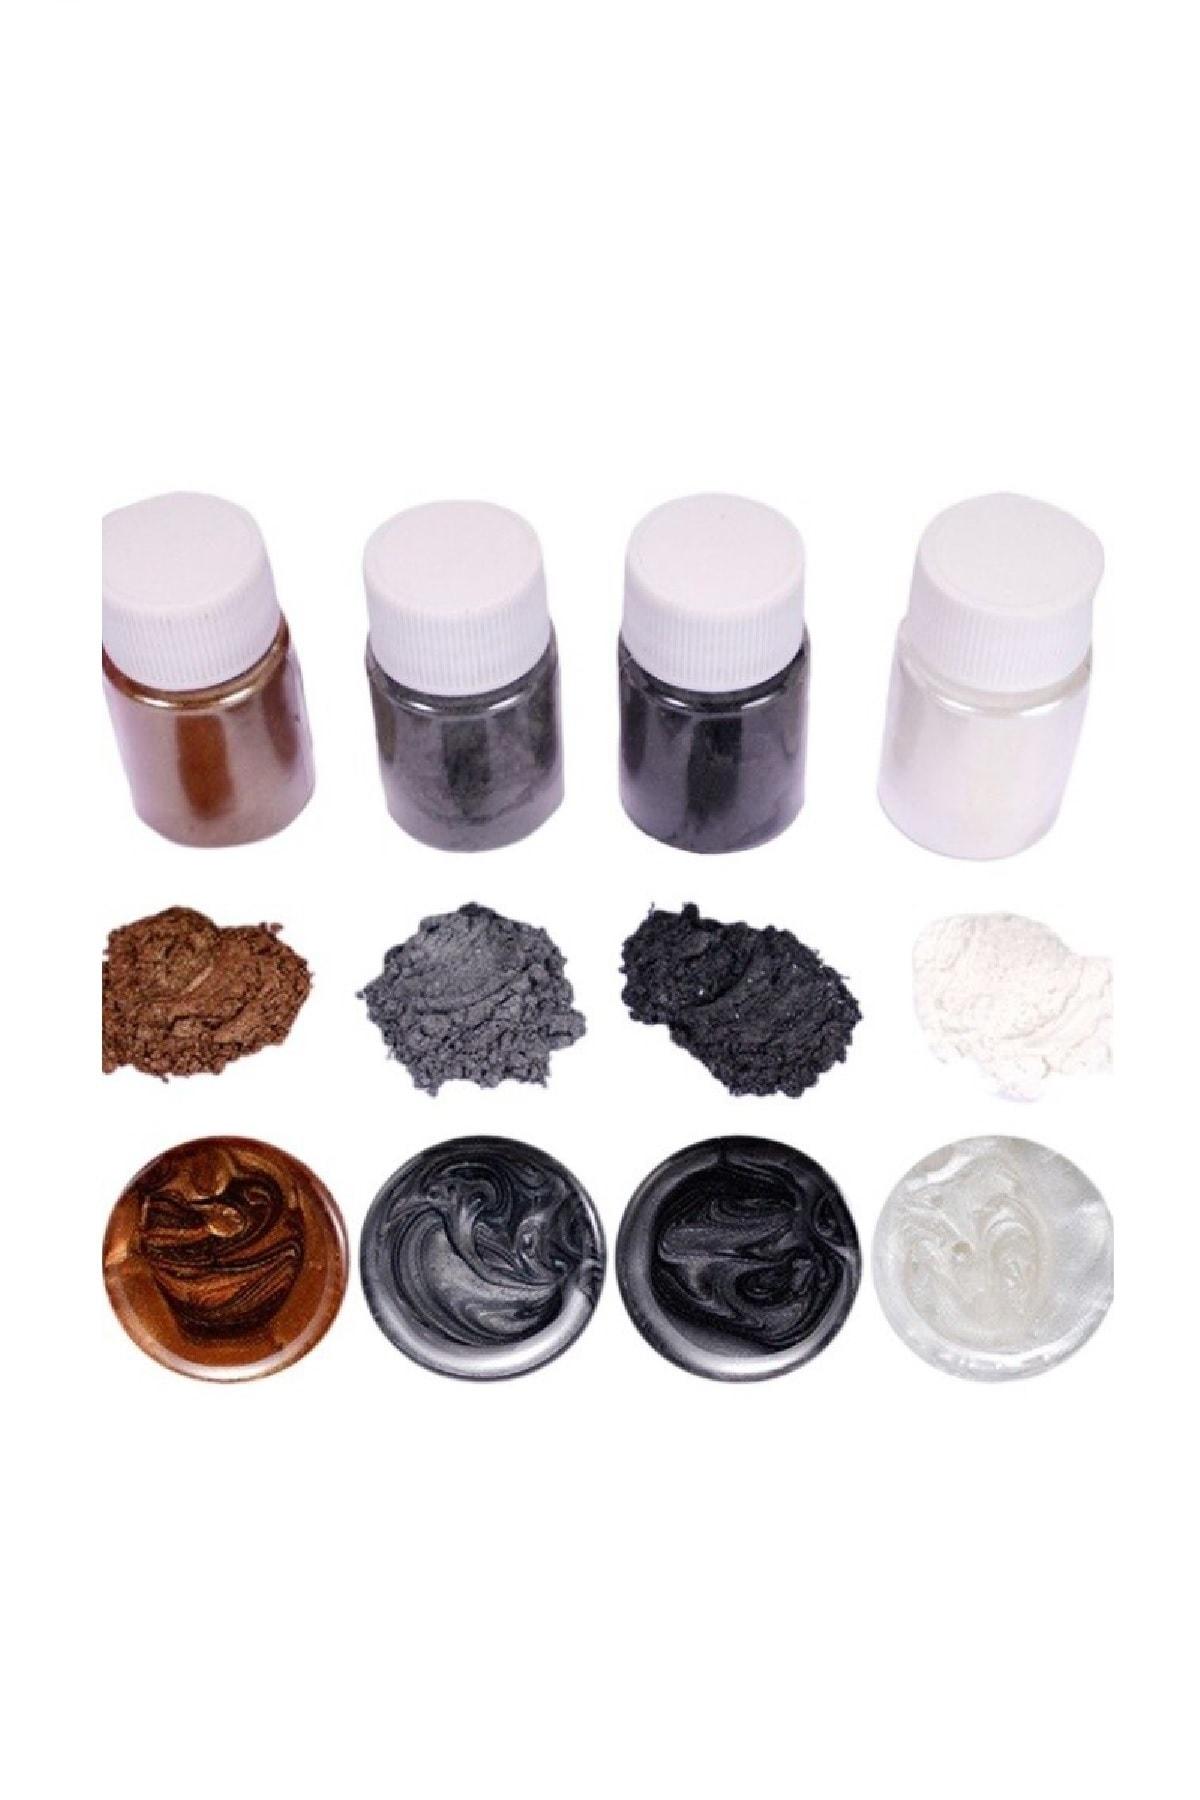 Brtr Kimya 4 Renk Siyah Sedefli Epoksi Metalik Toz Pigment Seti 1